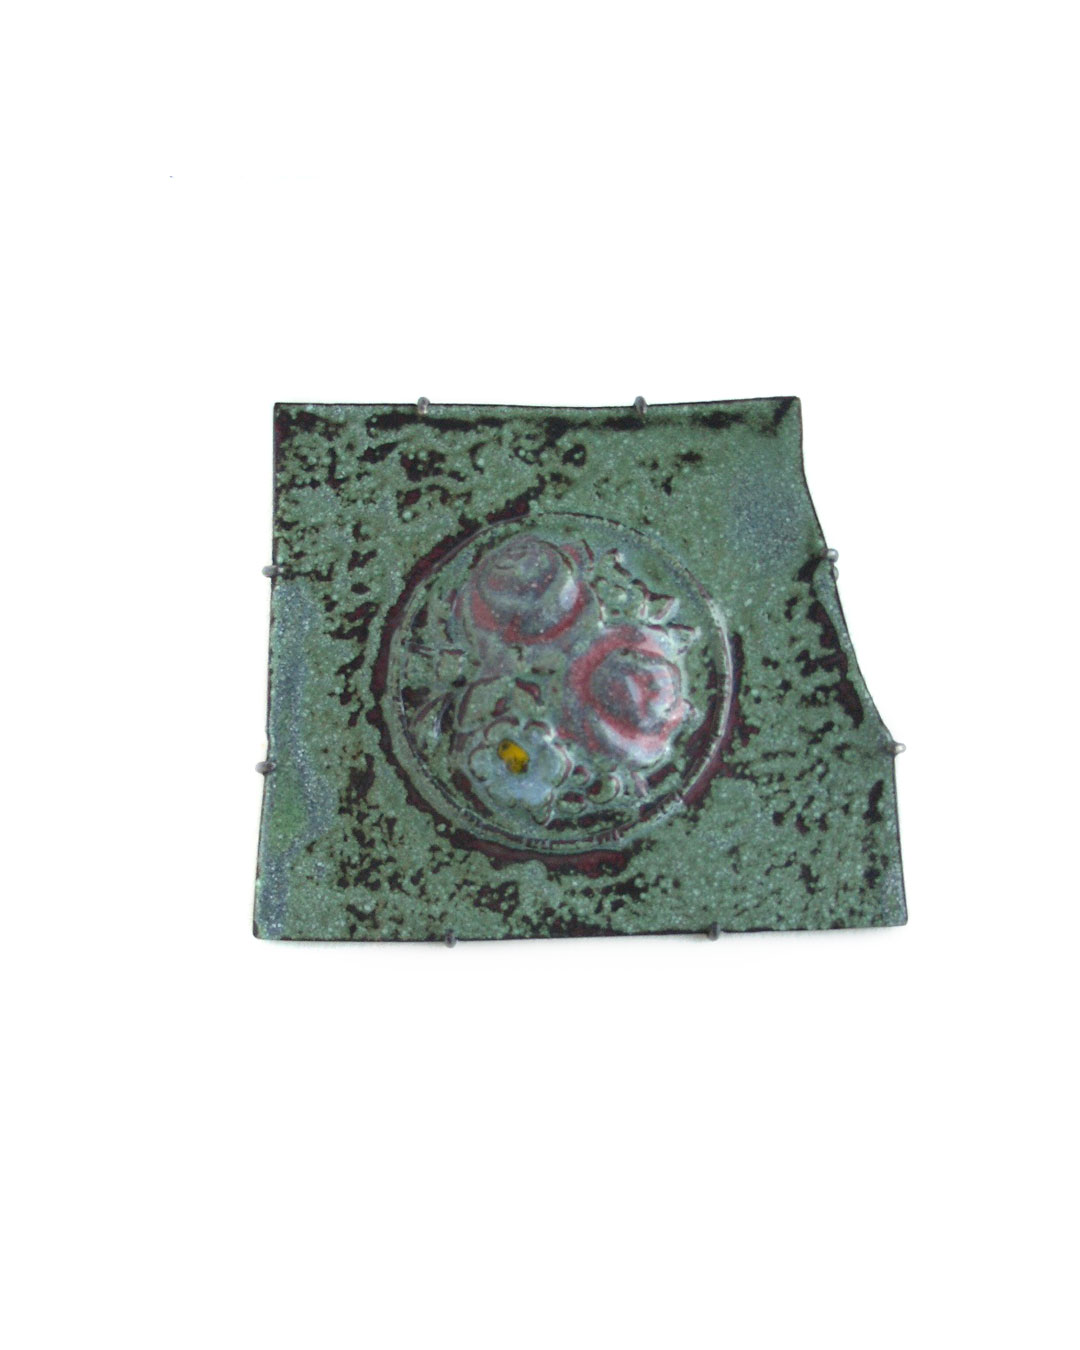 Vera Siemund, untitled, 2006, brooch; enamel, copper, silver, 50 x 60 x 5 mm, €705